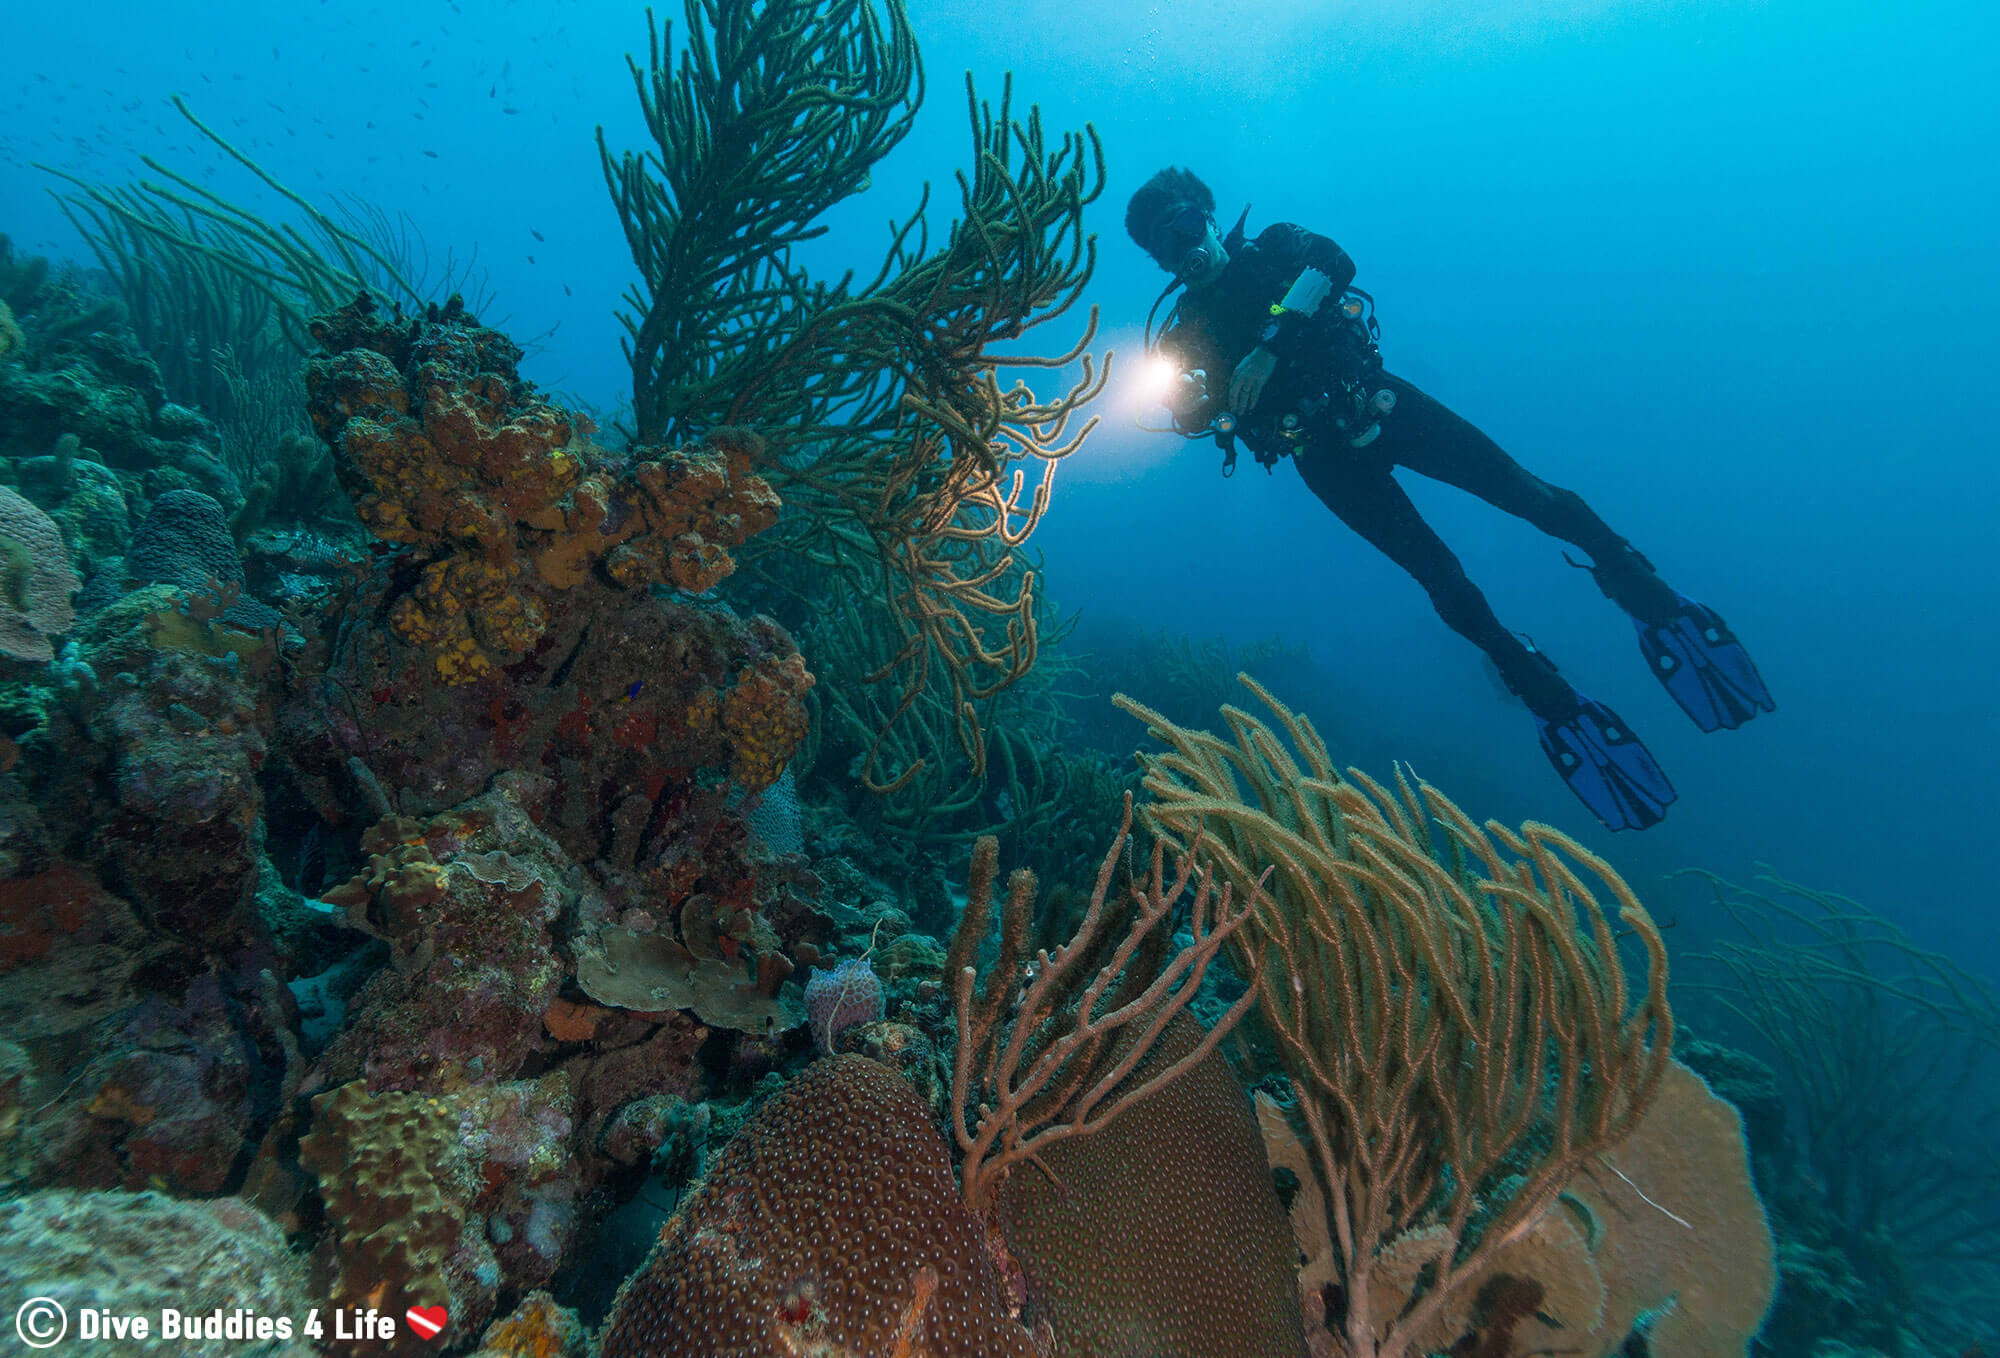 Dive Buddies 4 Life